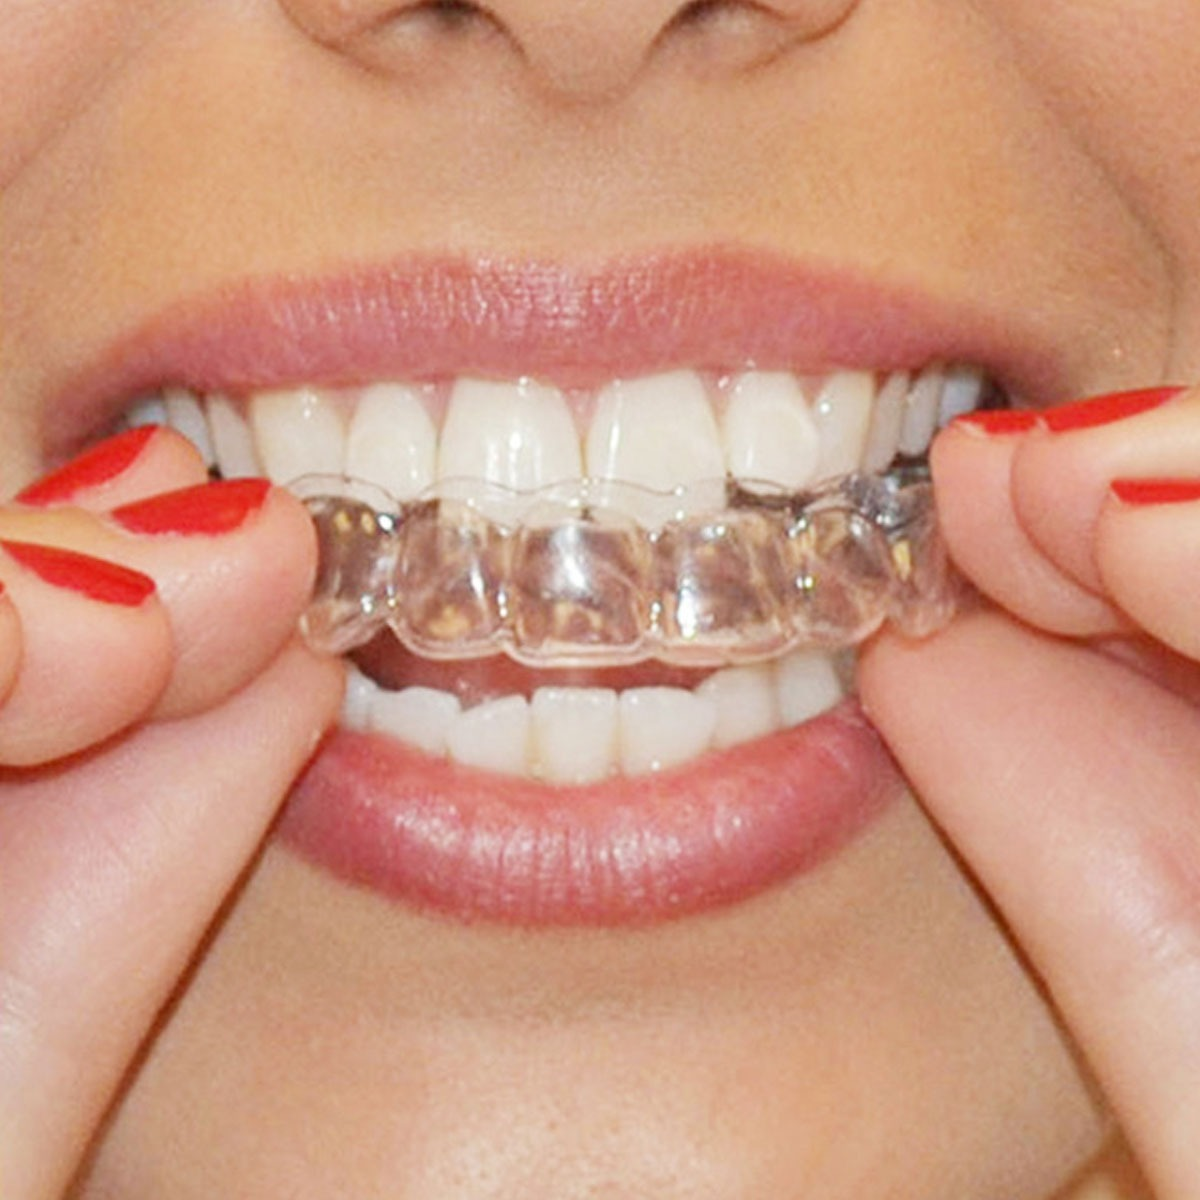 Clareamento Dental Whiteness Luz Caseiro Moldeira 10 Seringa R 55